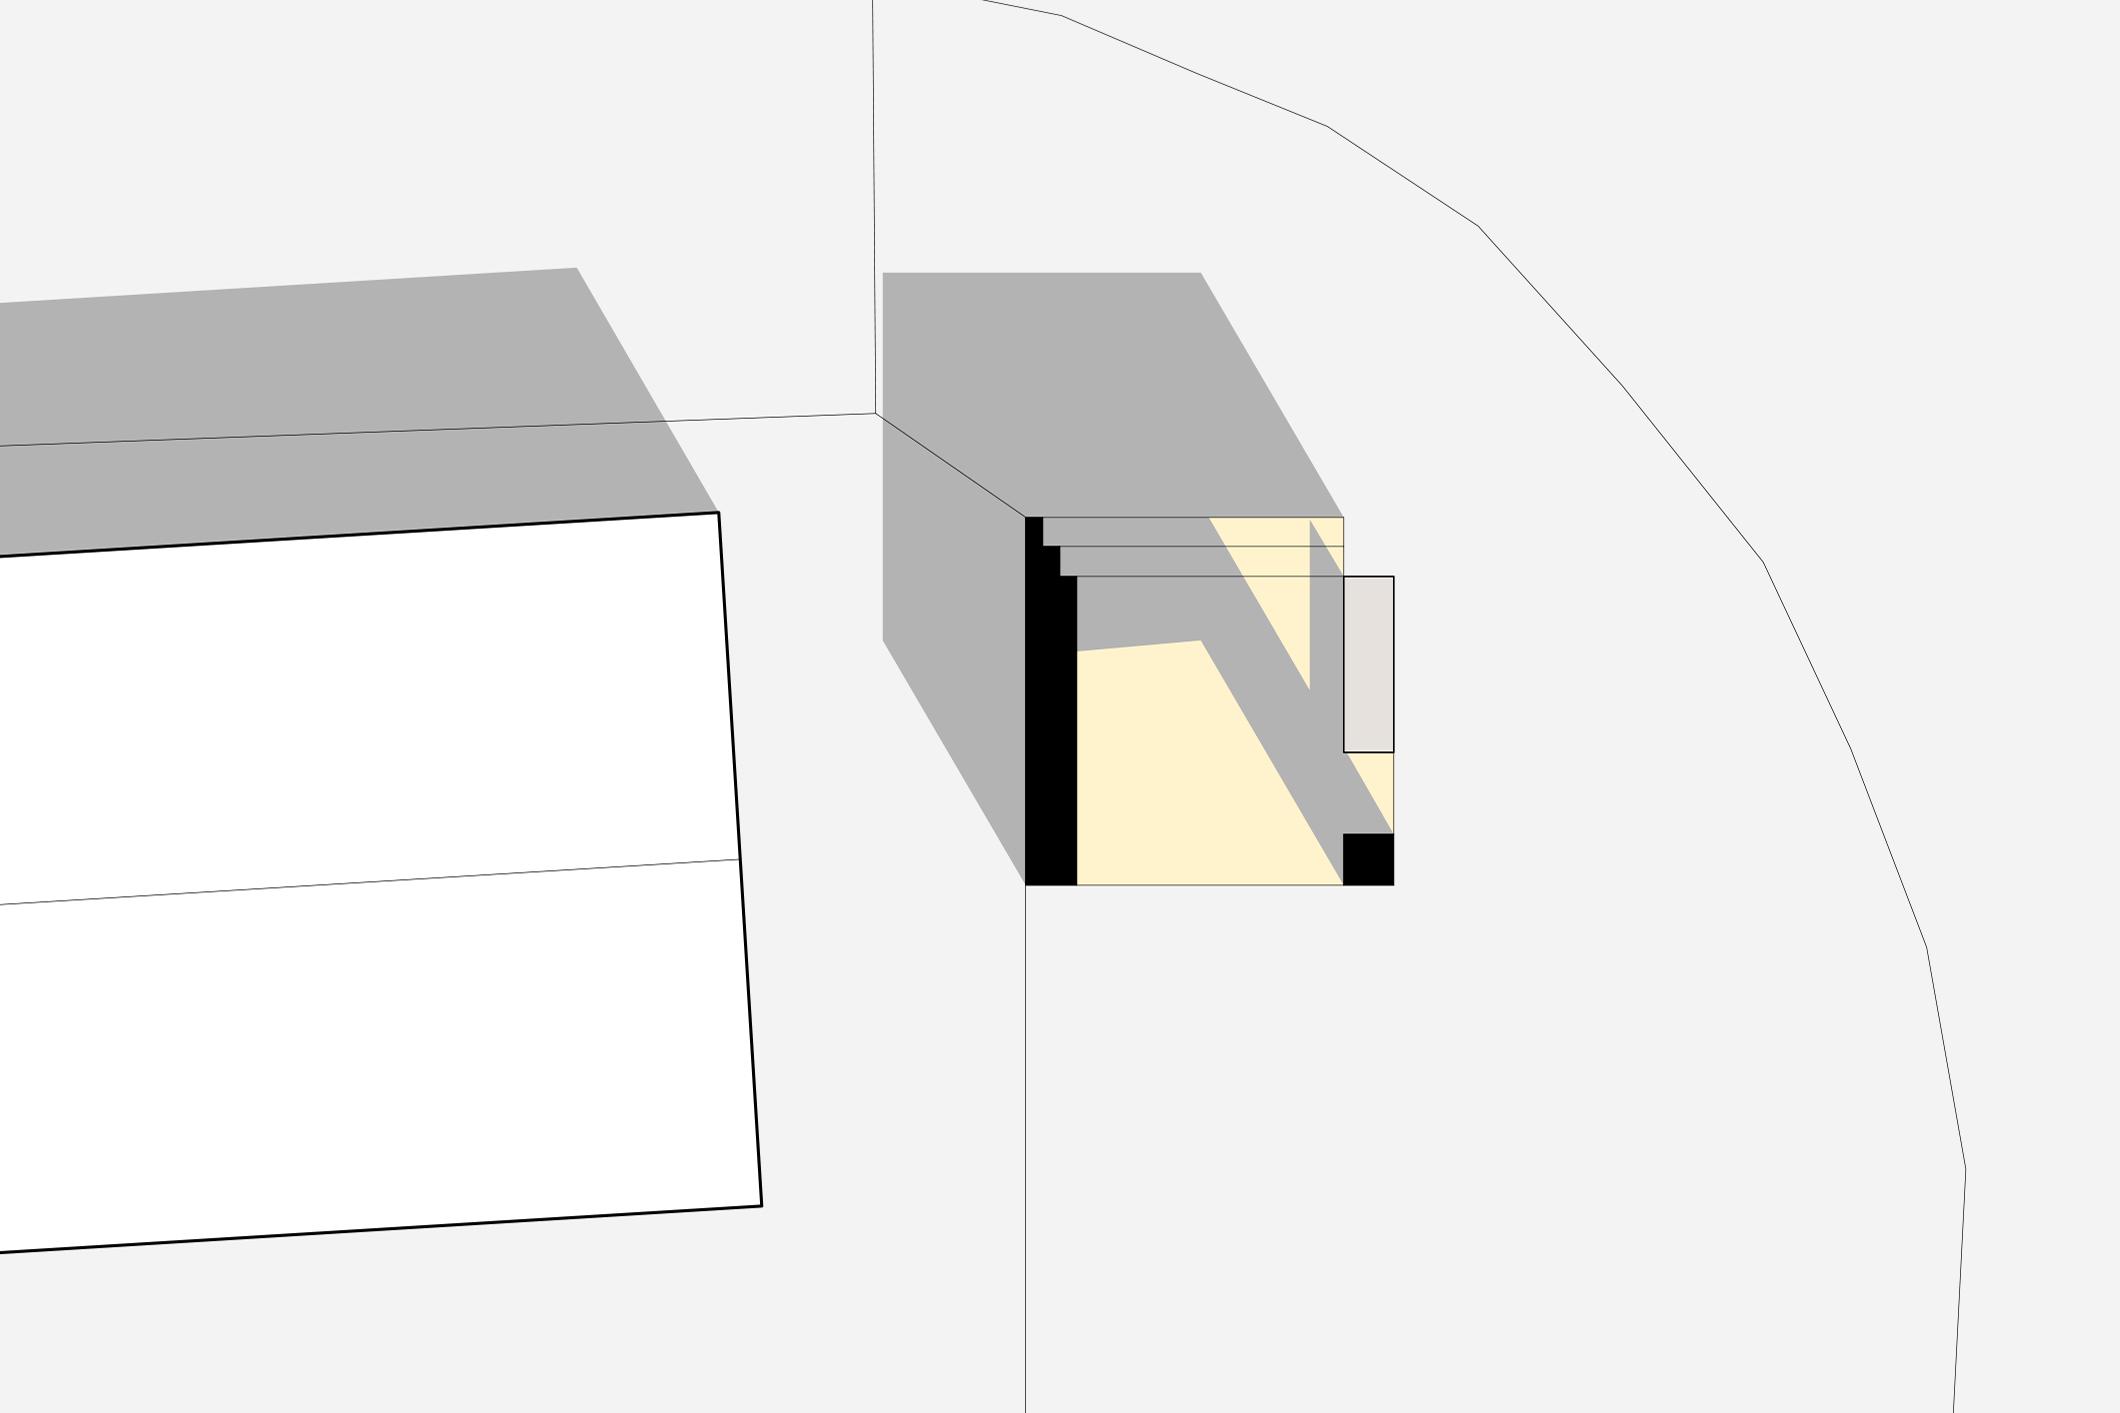 001-Block Plan.jpg